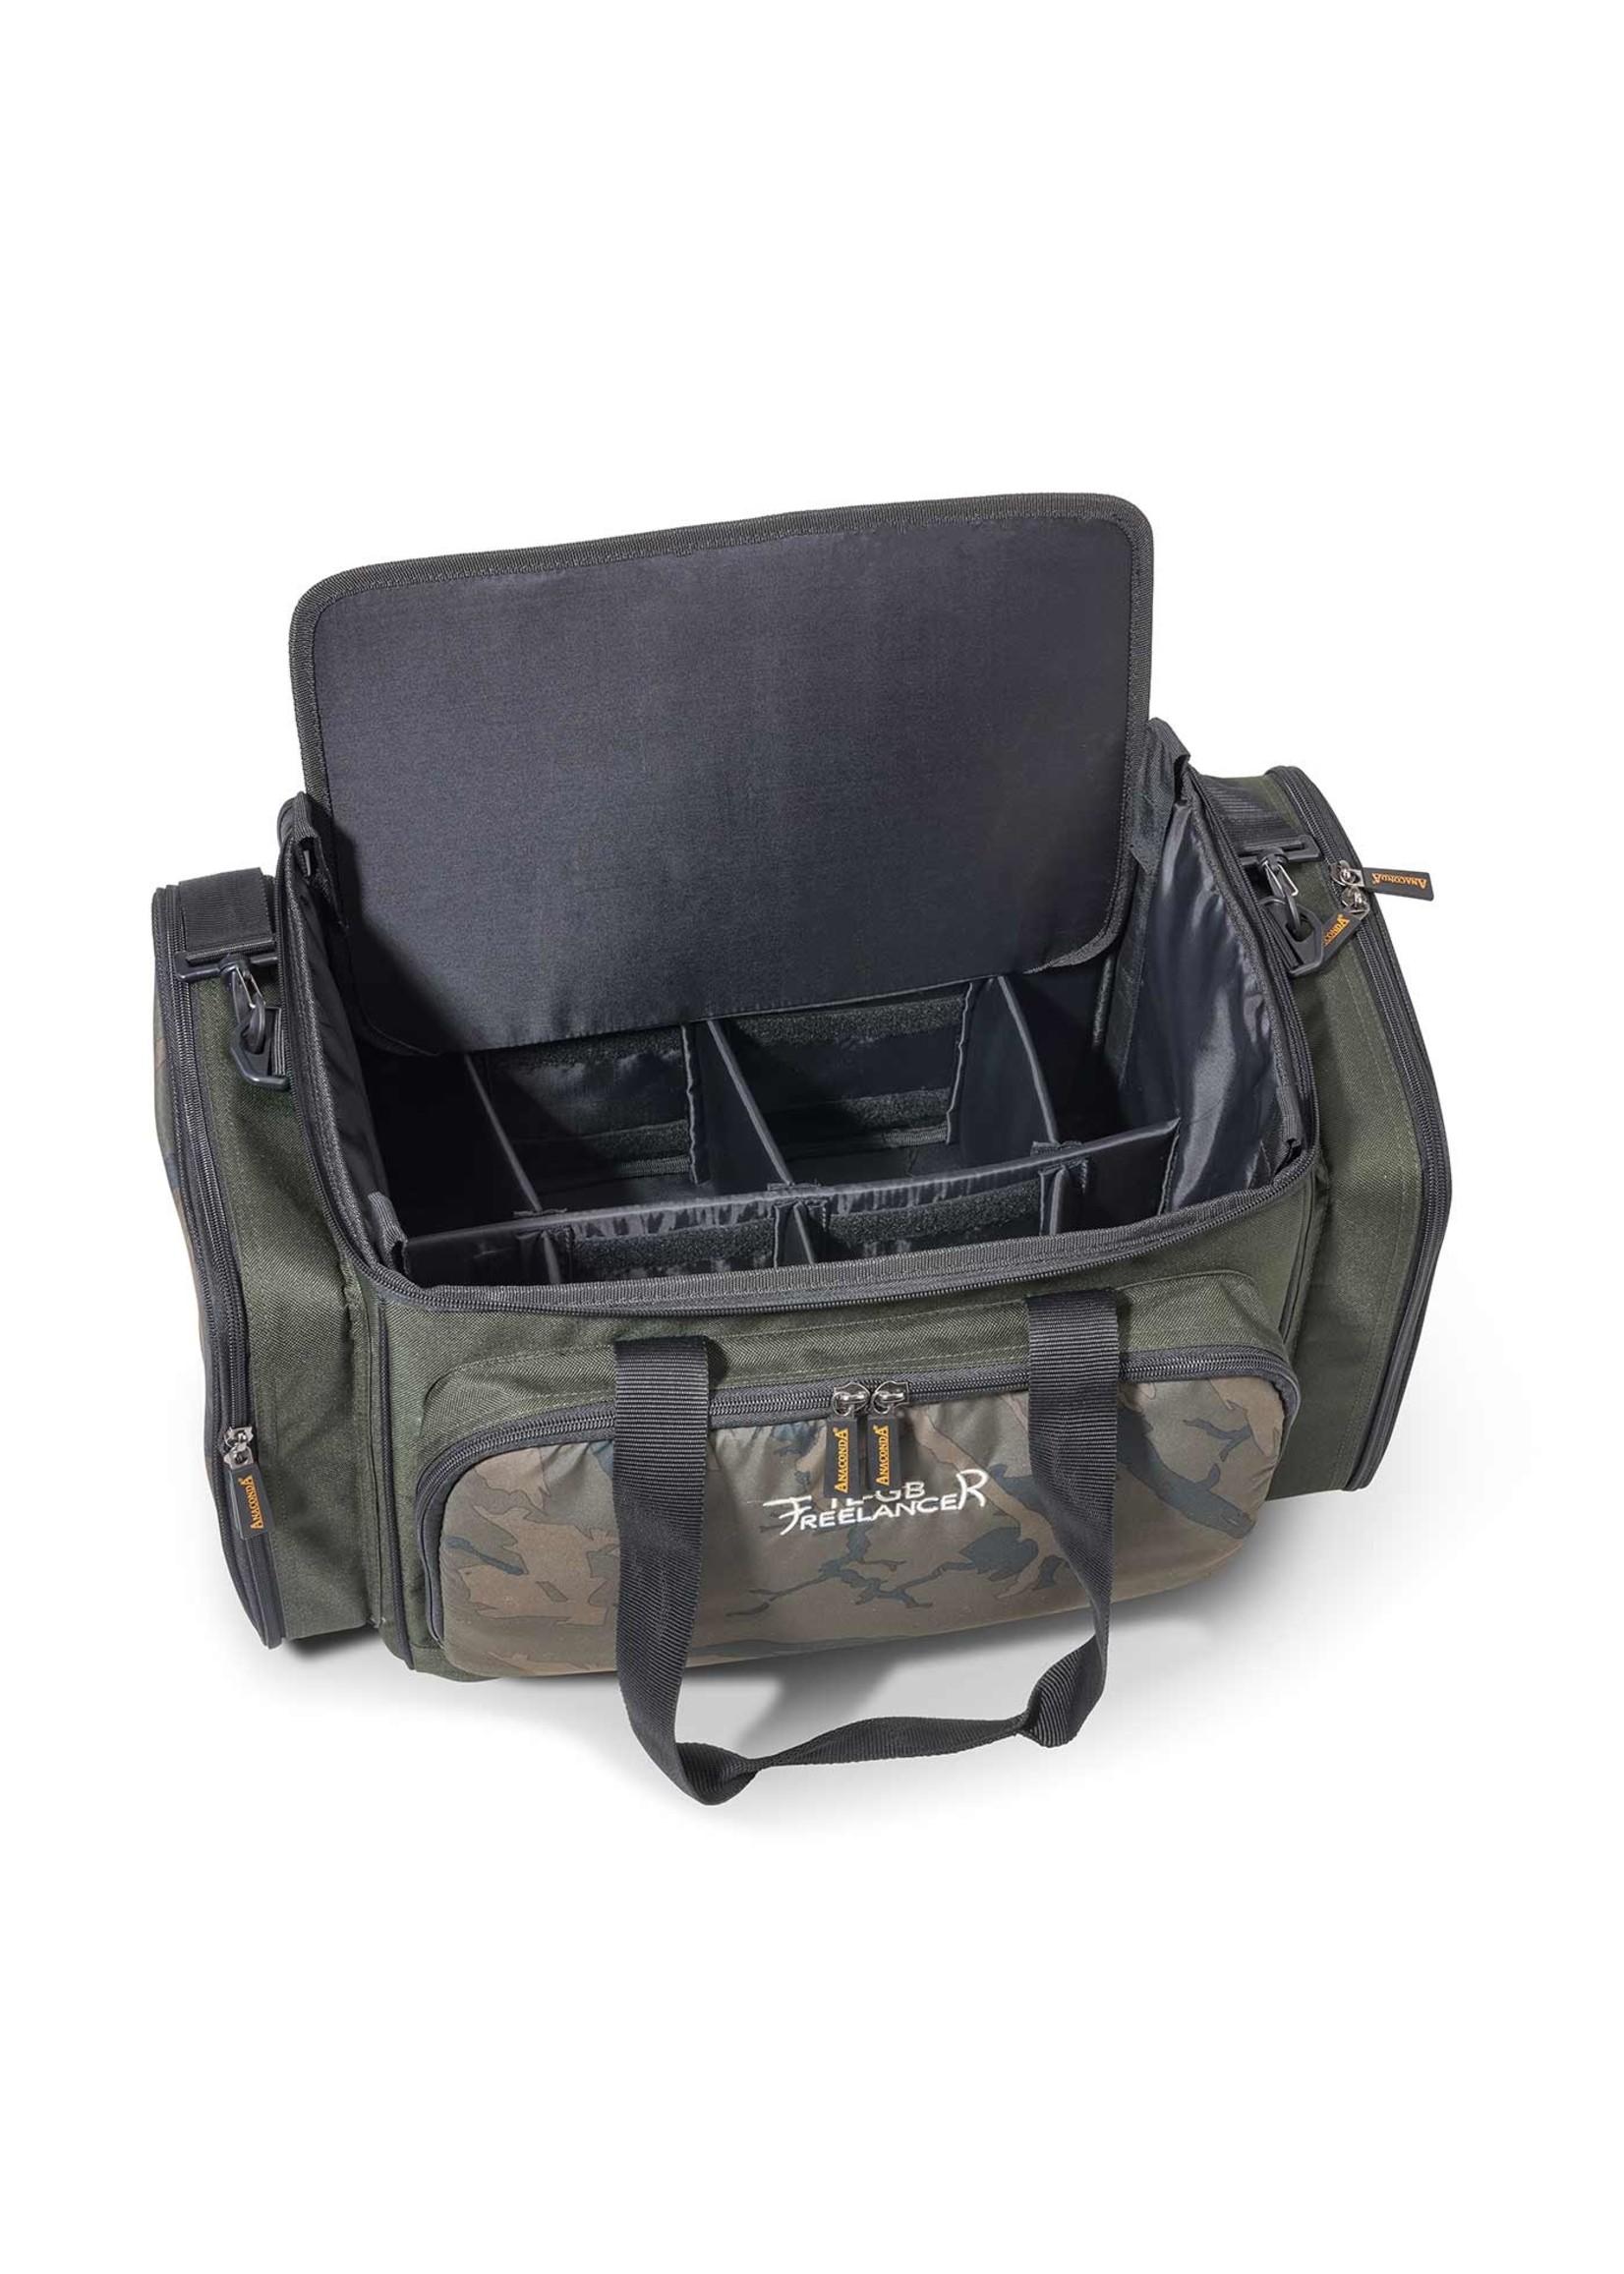 Anaconda Anaconda Freelancer Tab Lock Gear Bag